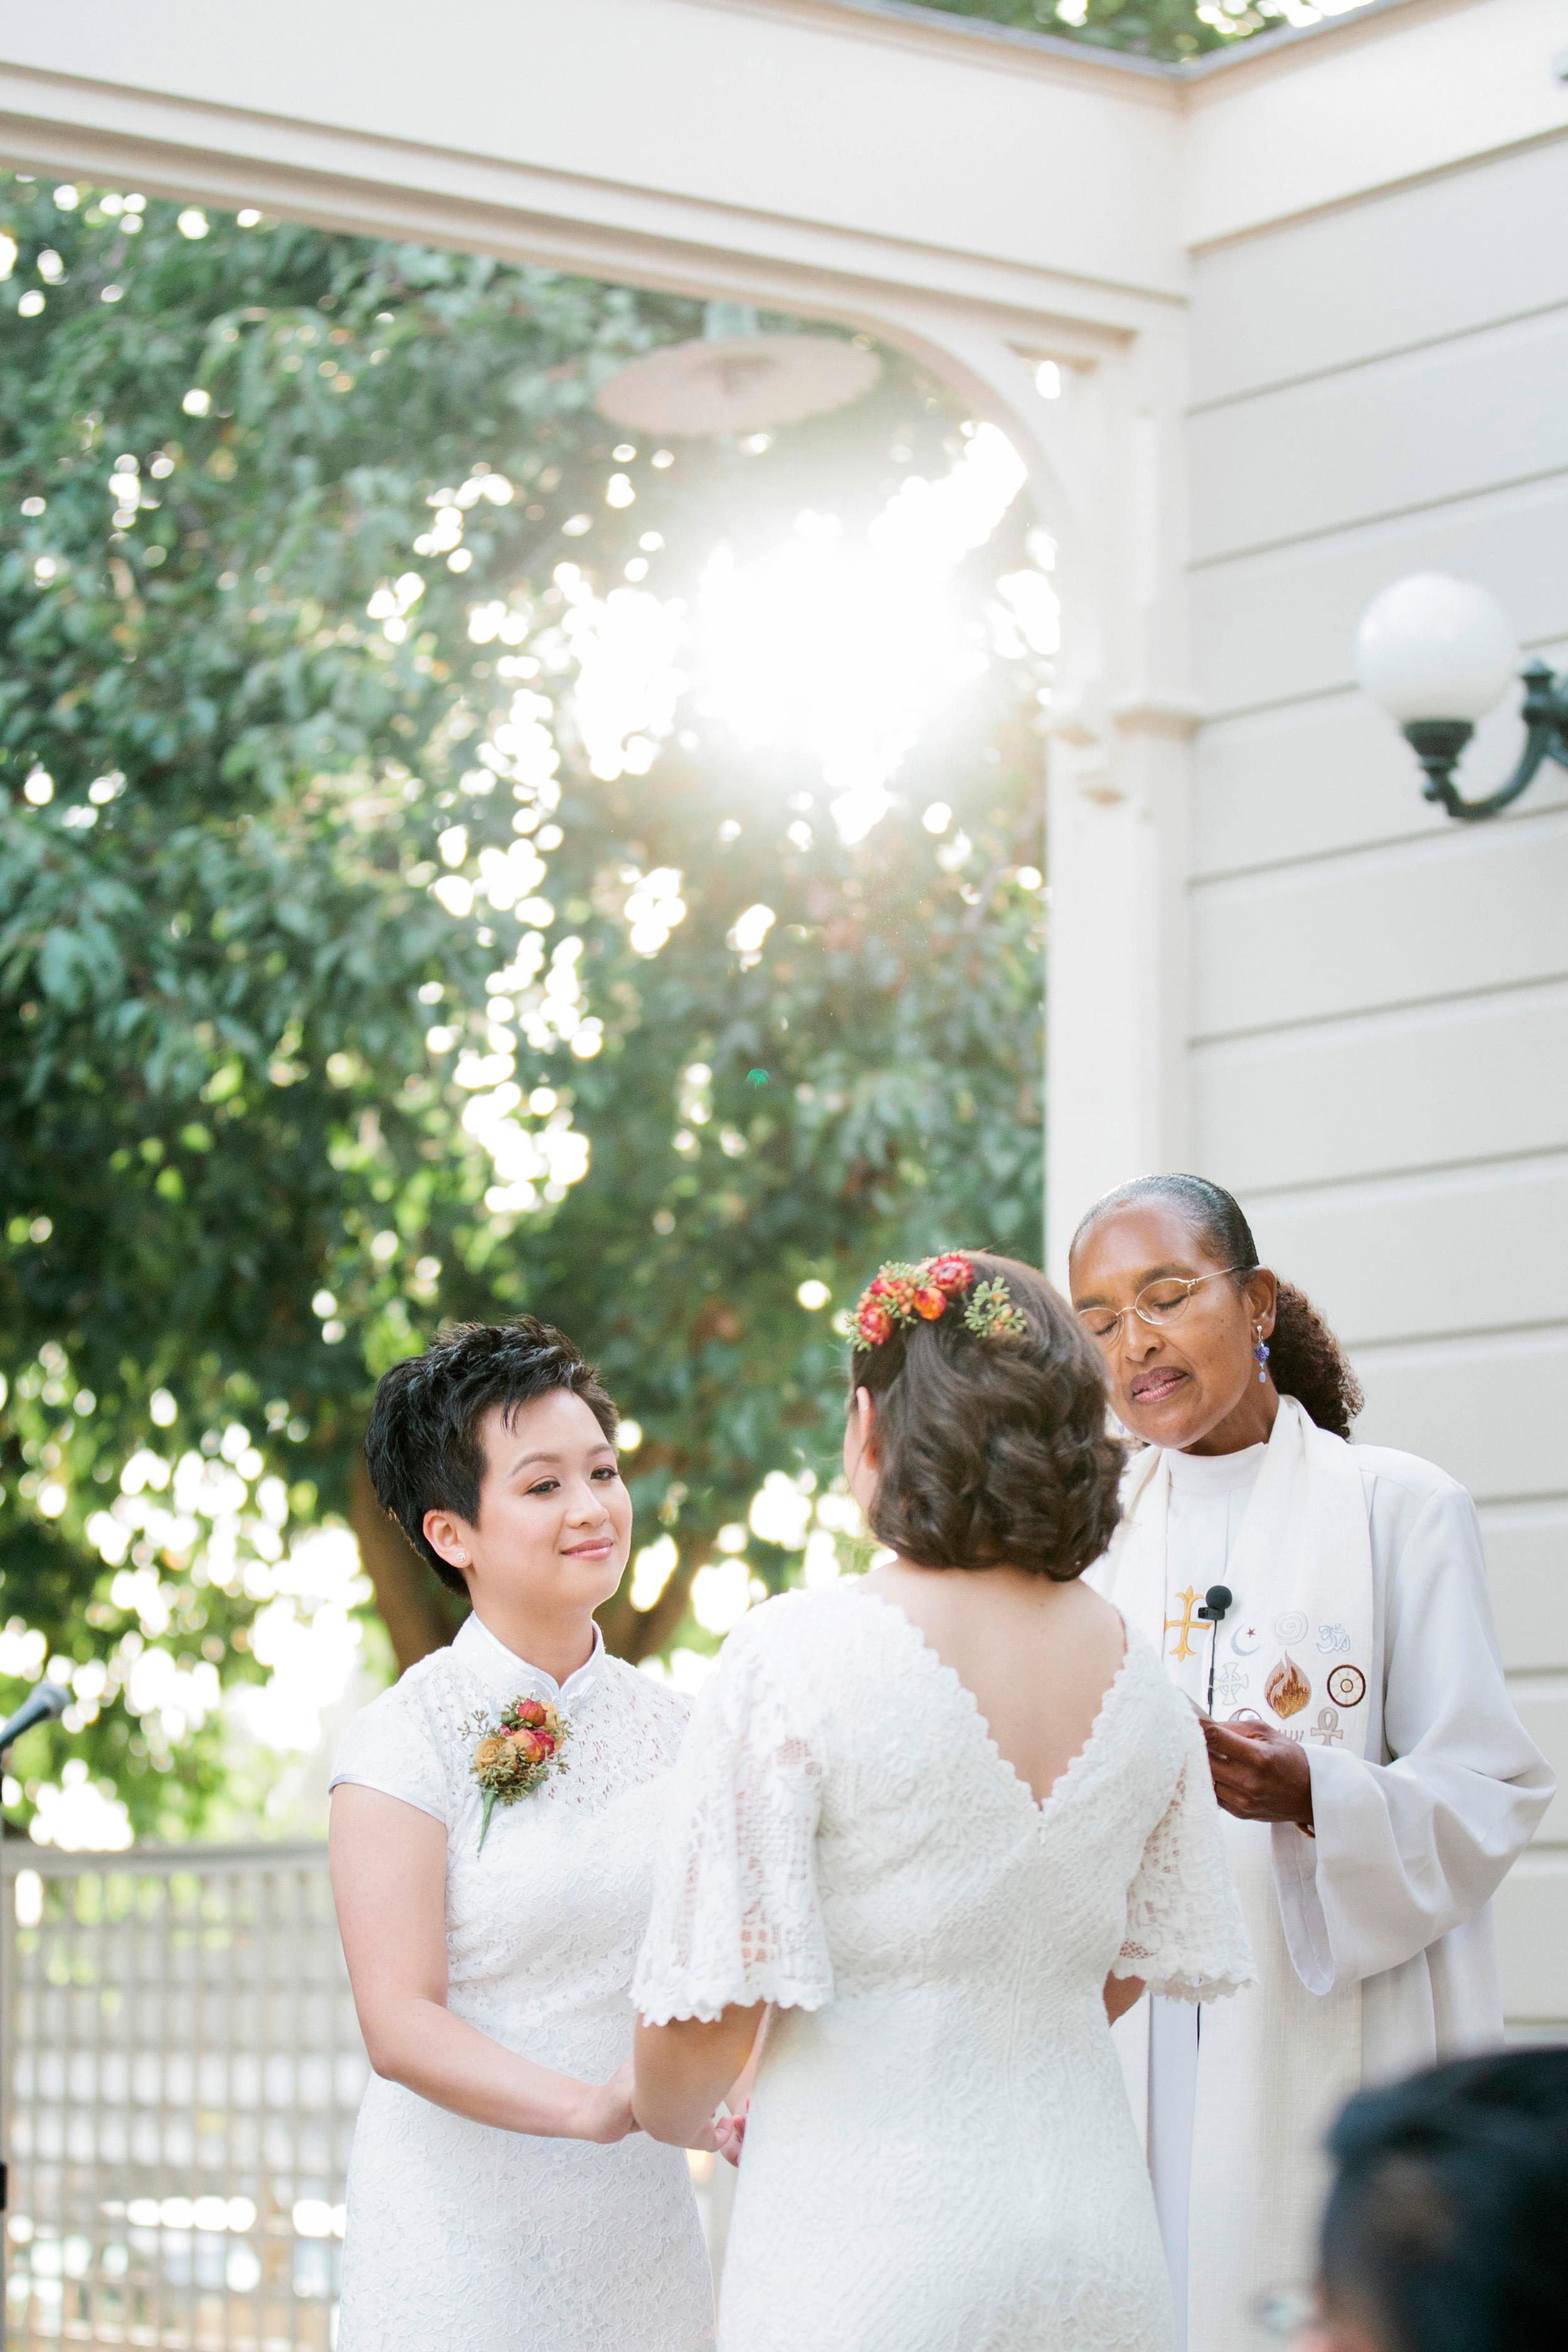 Oakland-Preservation-Park-Wedding-023.JPG